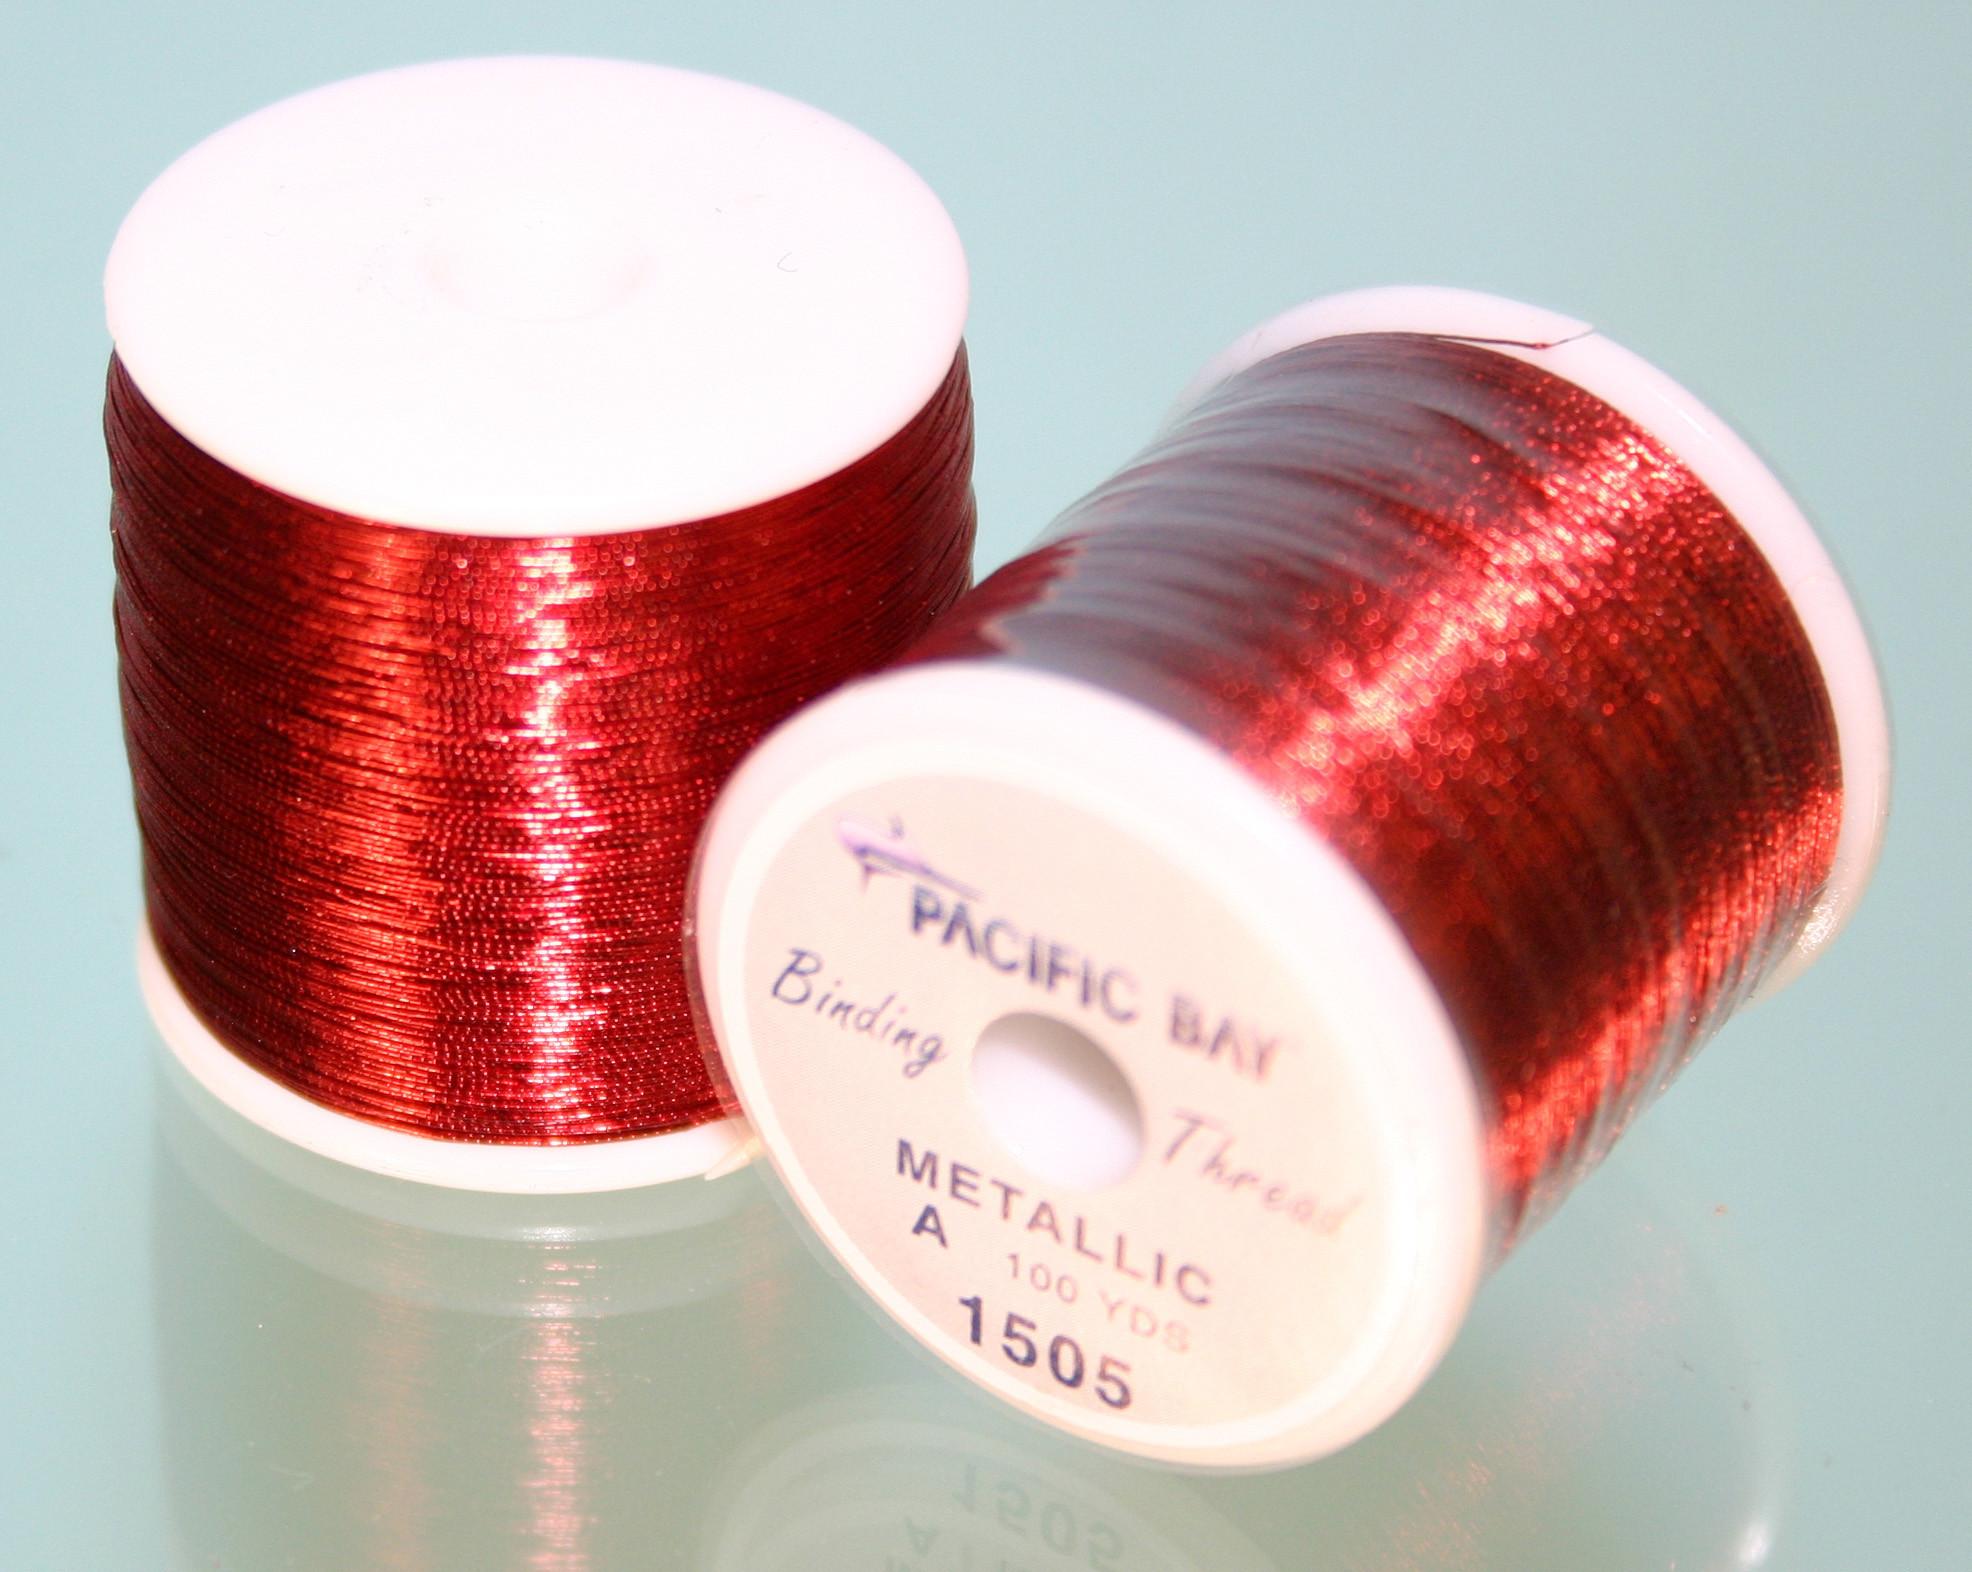 PAC BAY ROD WINDING METALLIC THREAD RED SIZE A-1505 100YDS SPOOL